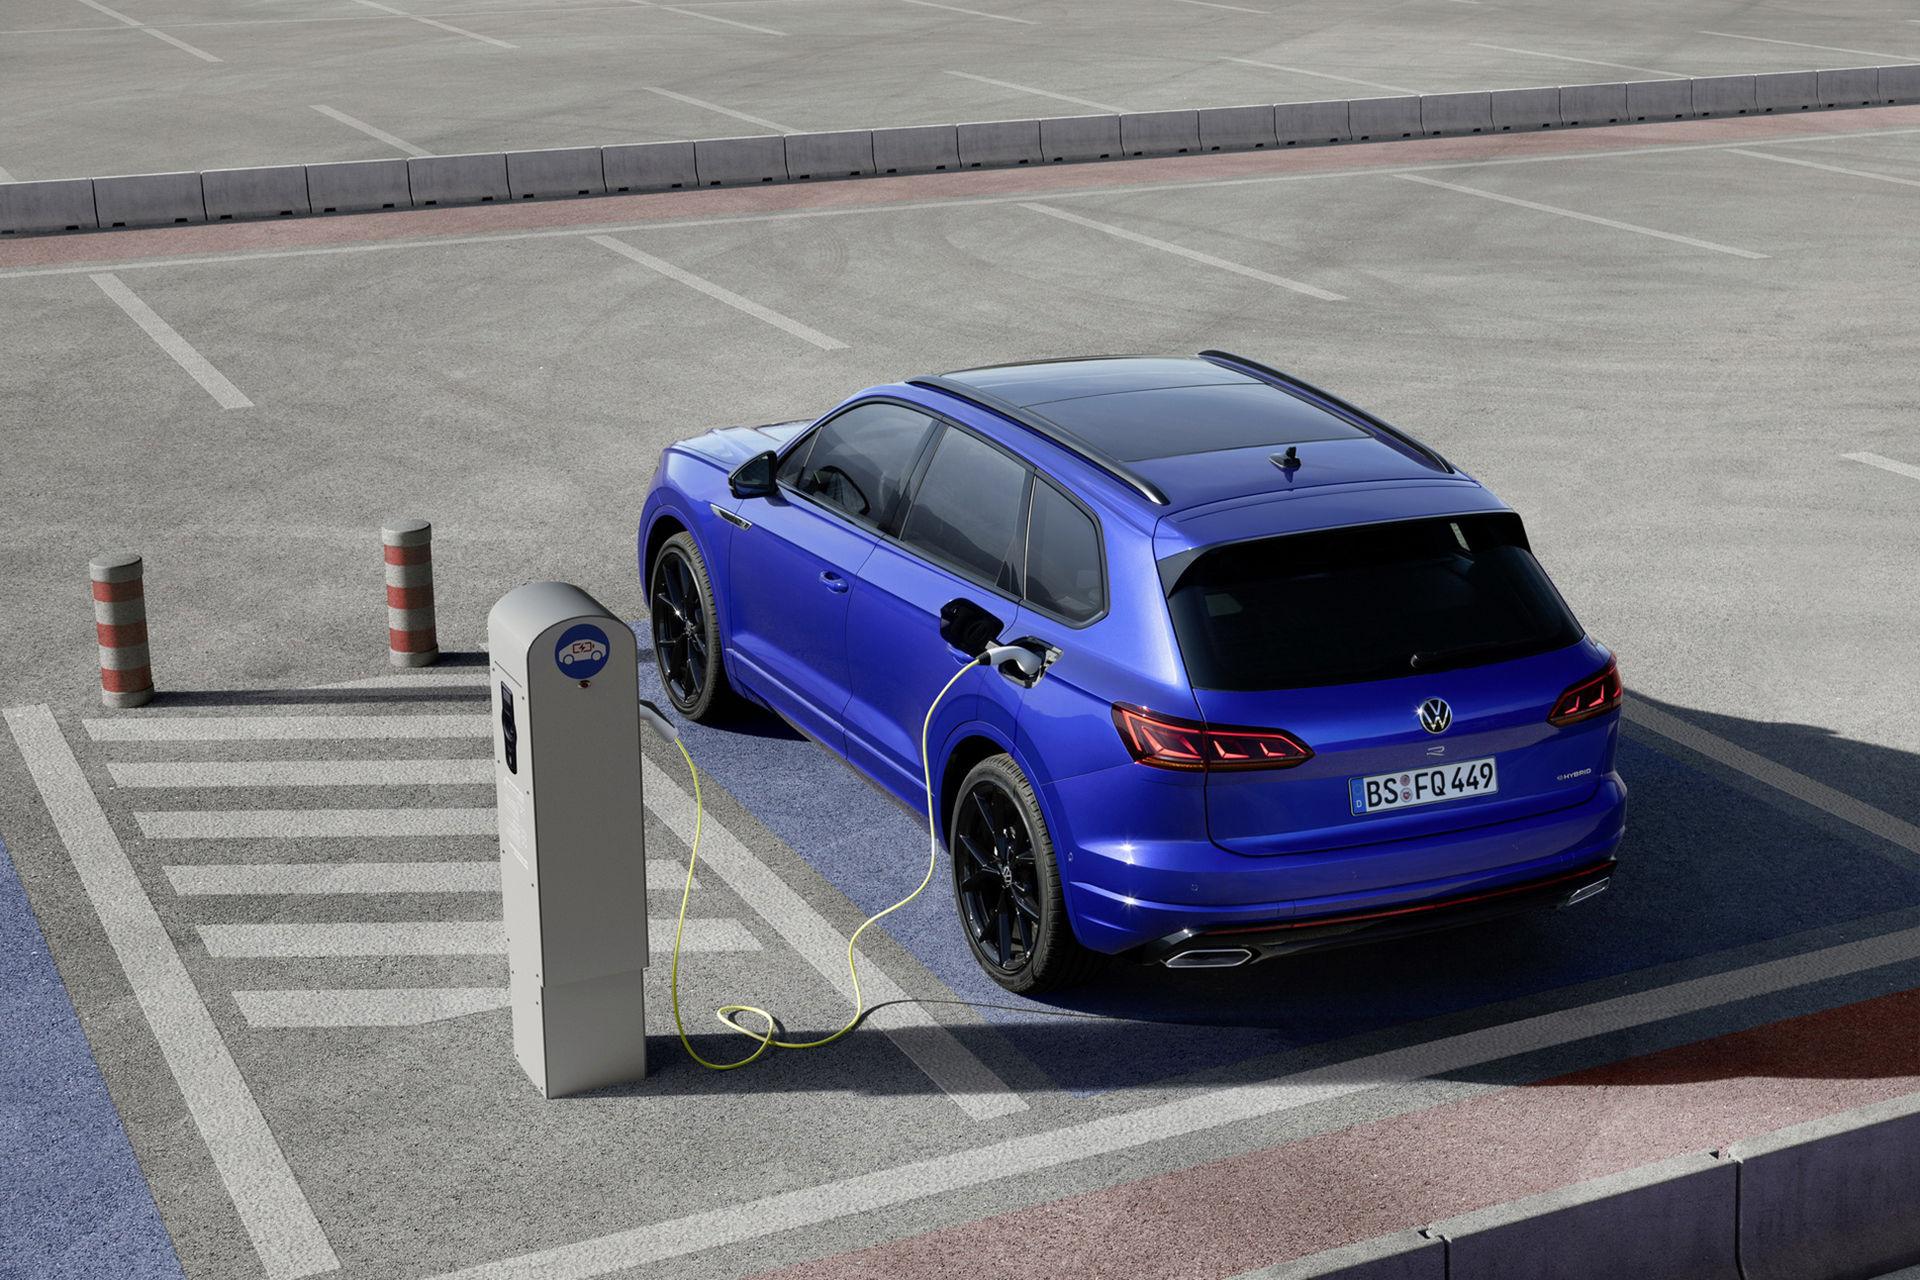 Volkswagen Touareg nu även som laddhybrid